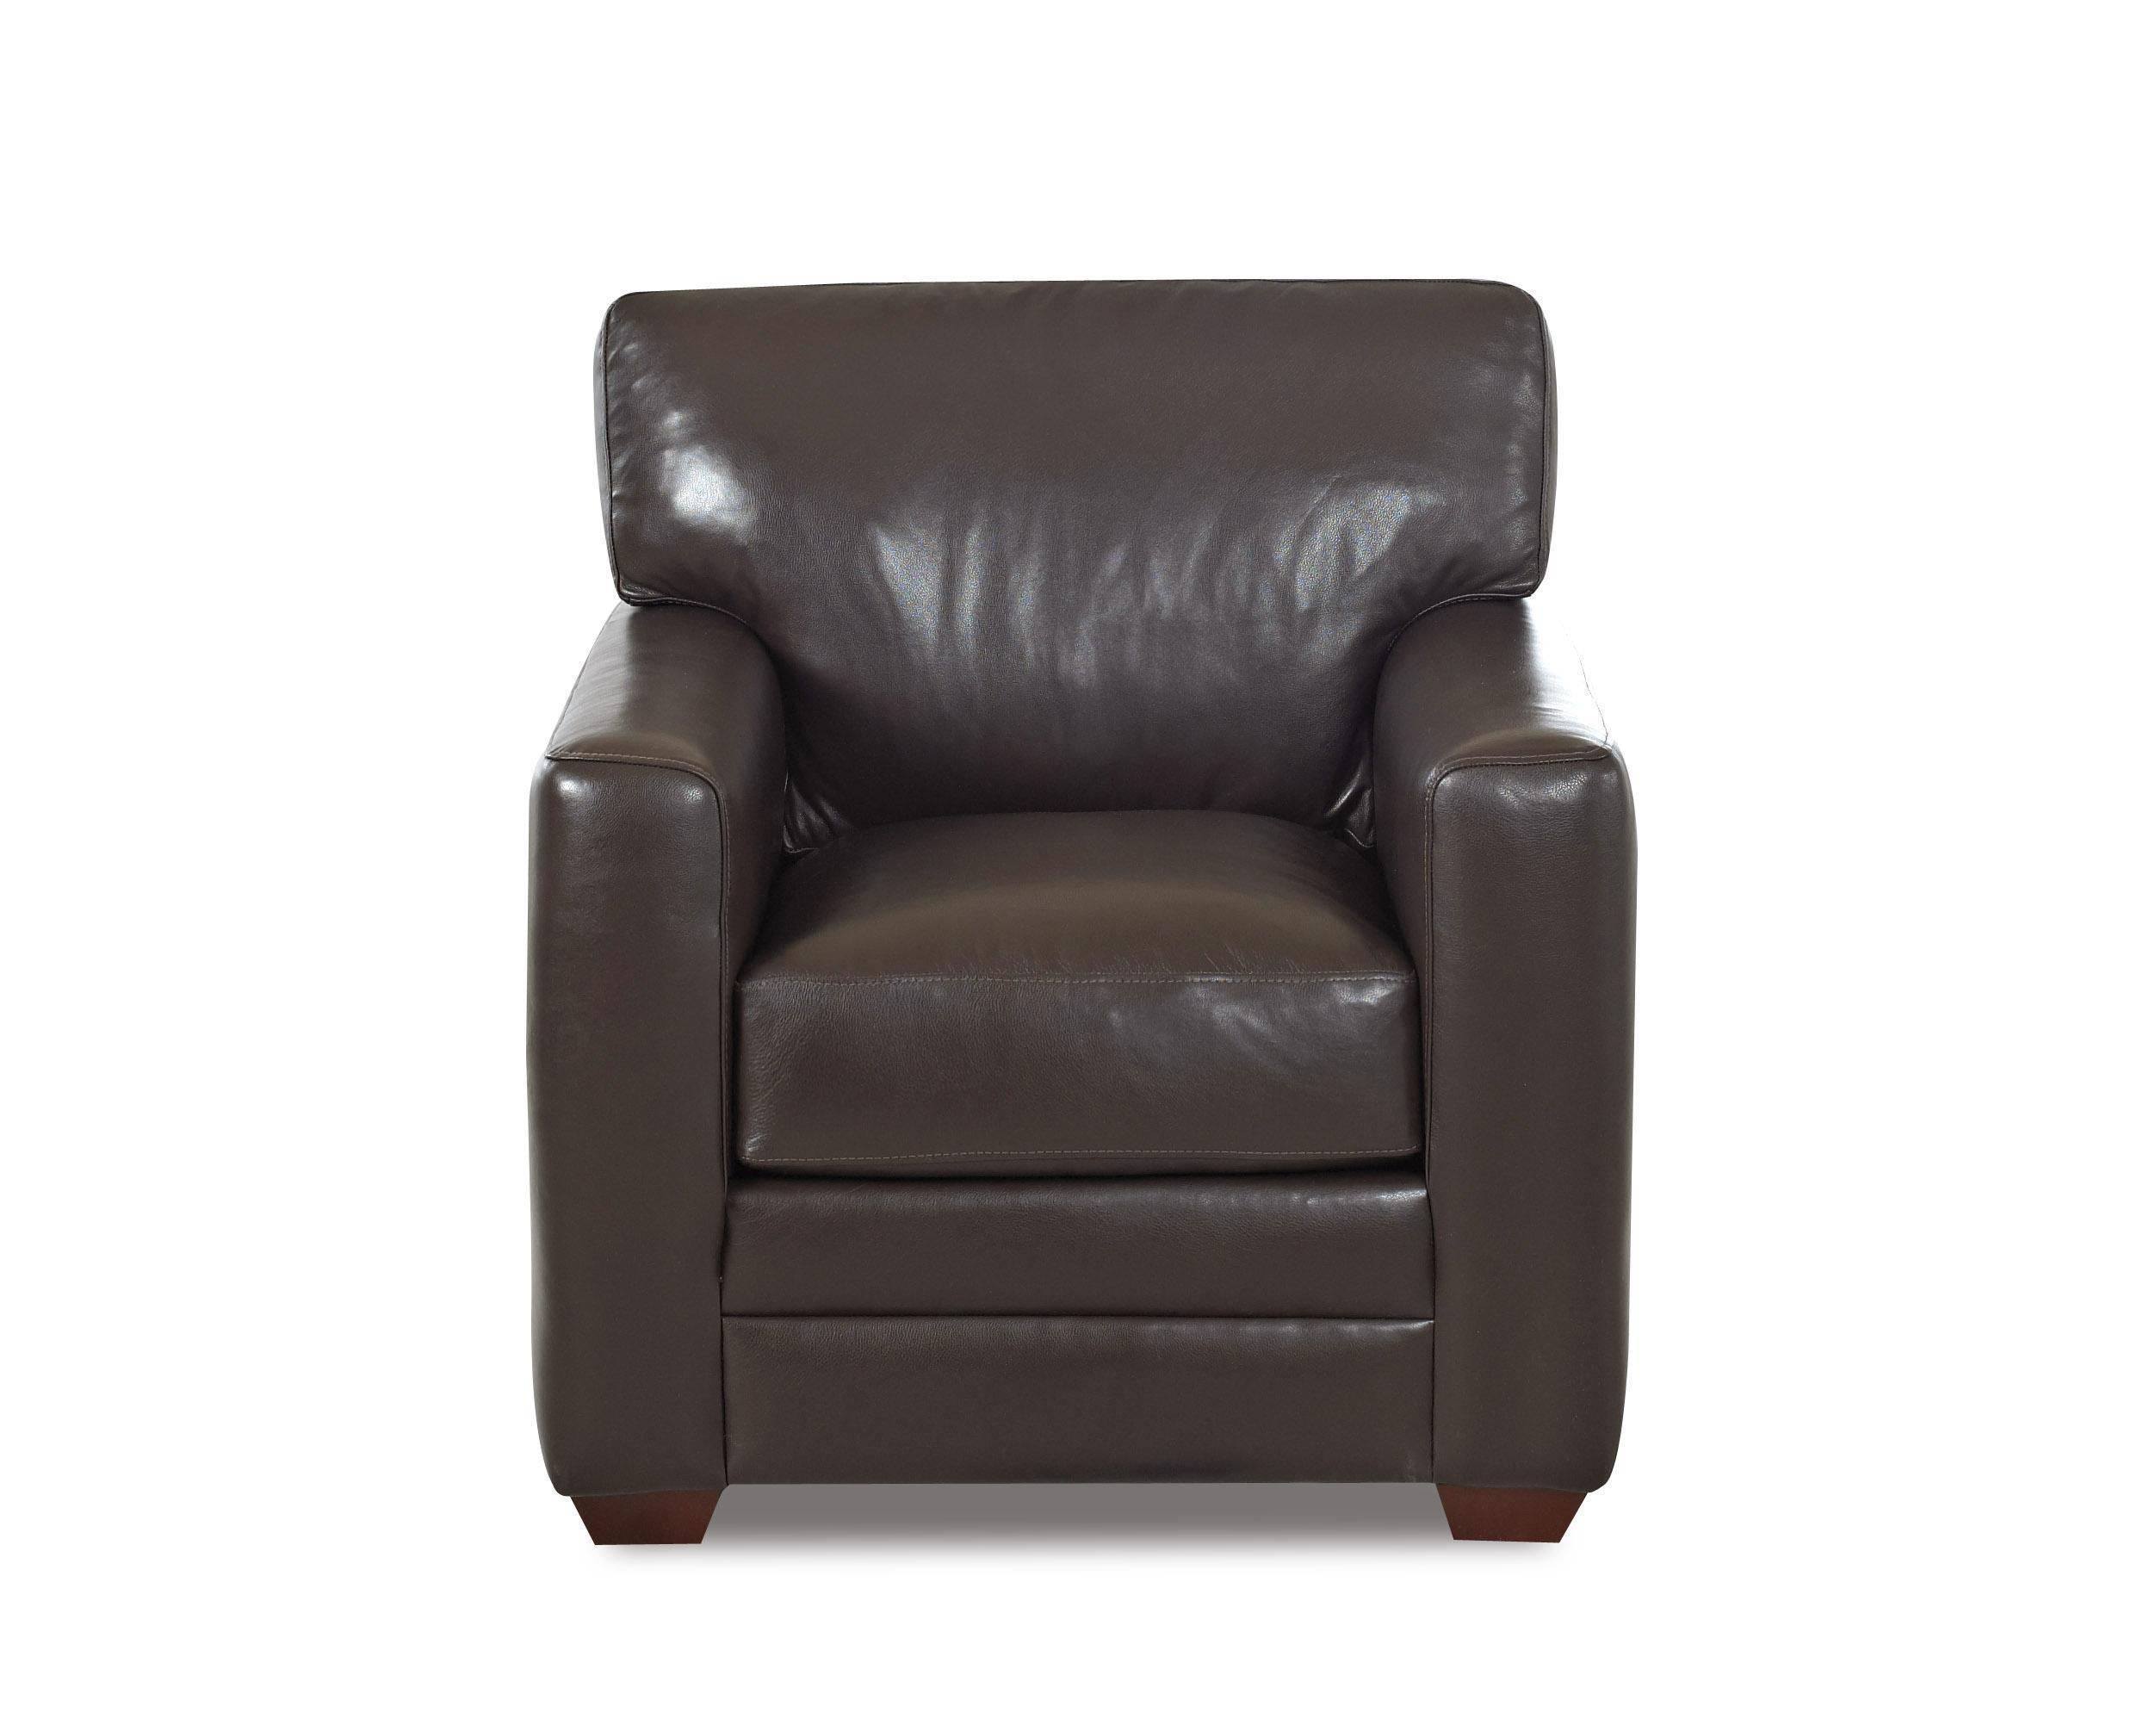 Klaussner Fedora Chair - Item Number: LT50900 C